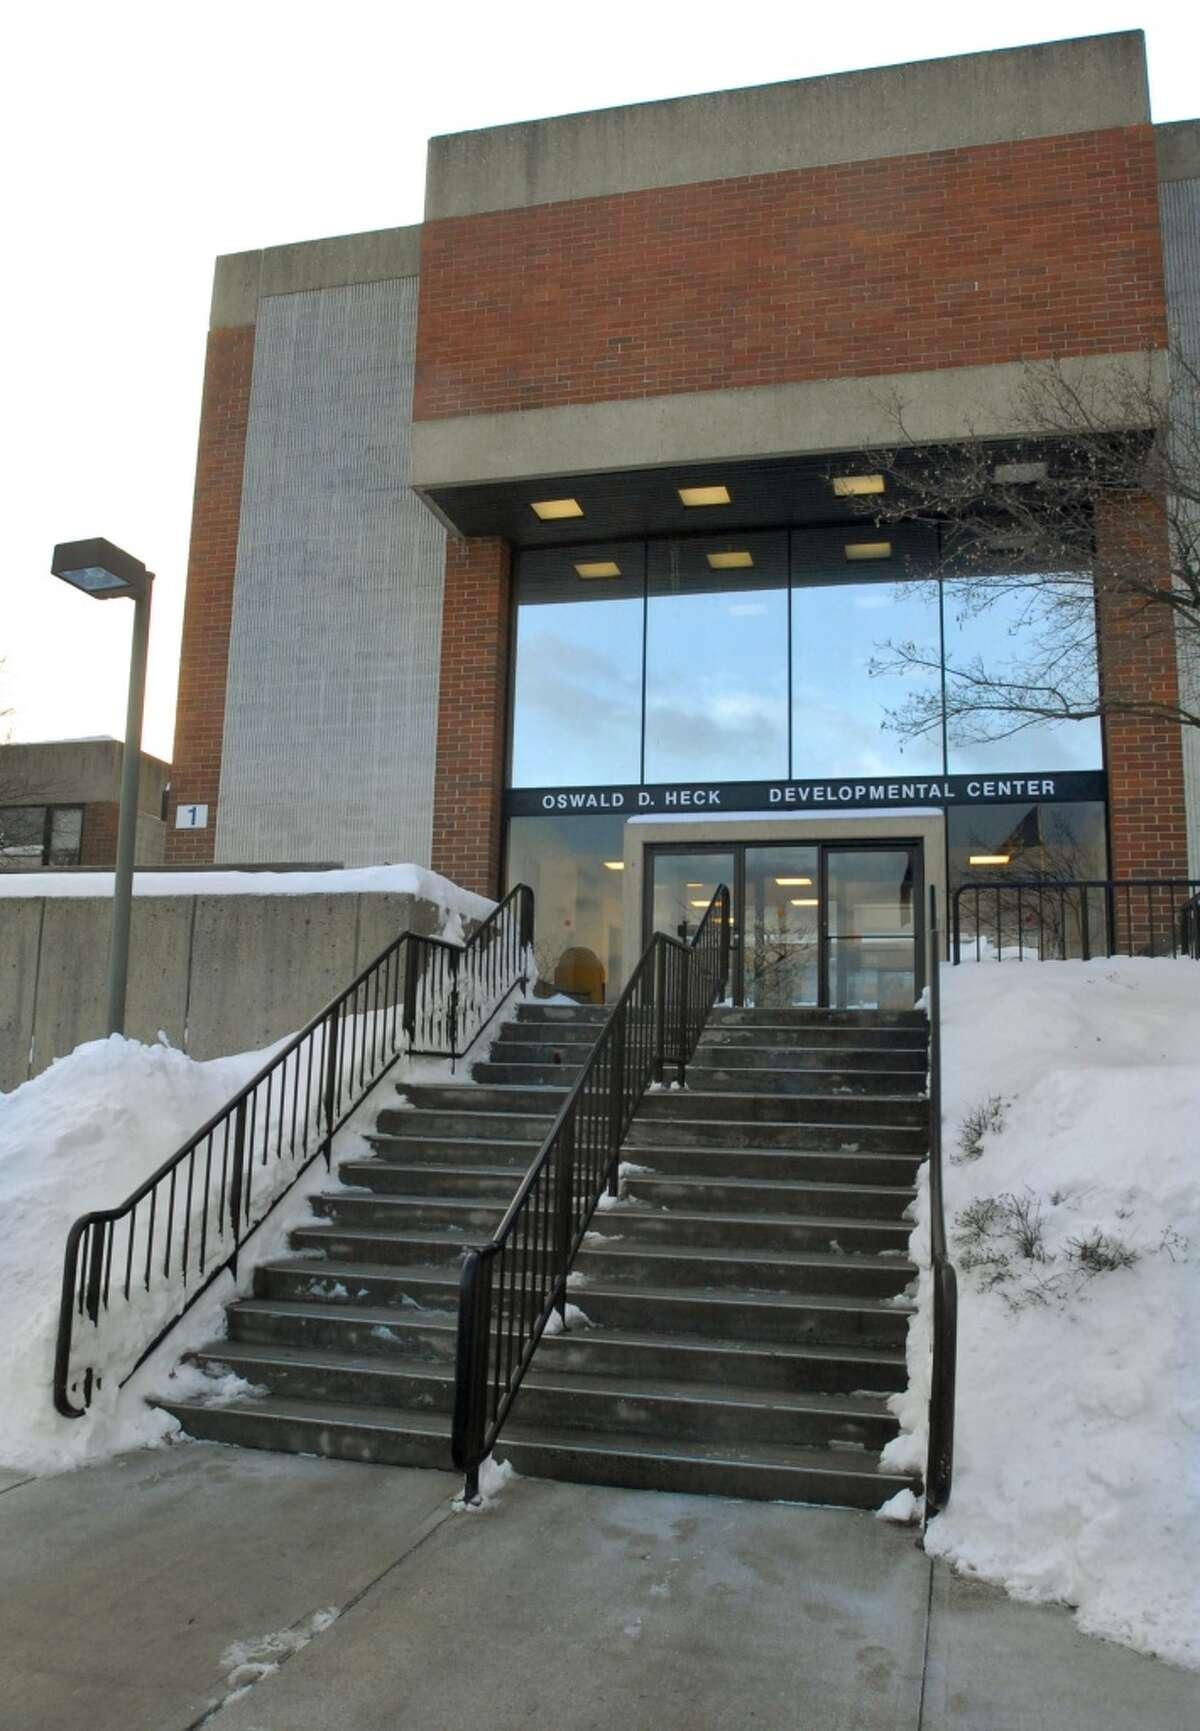 The Oswald D. Heck developmental center in Niskayuna.